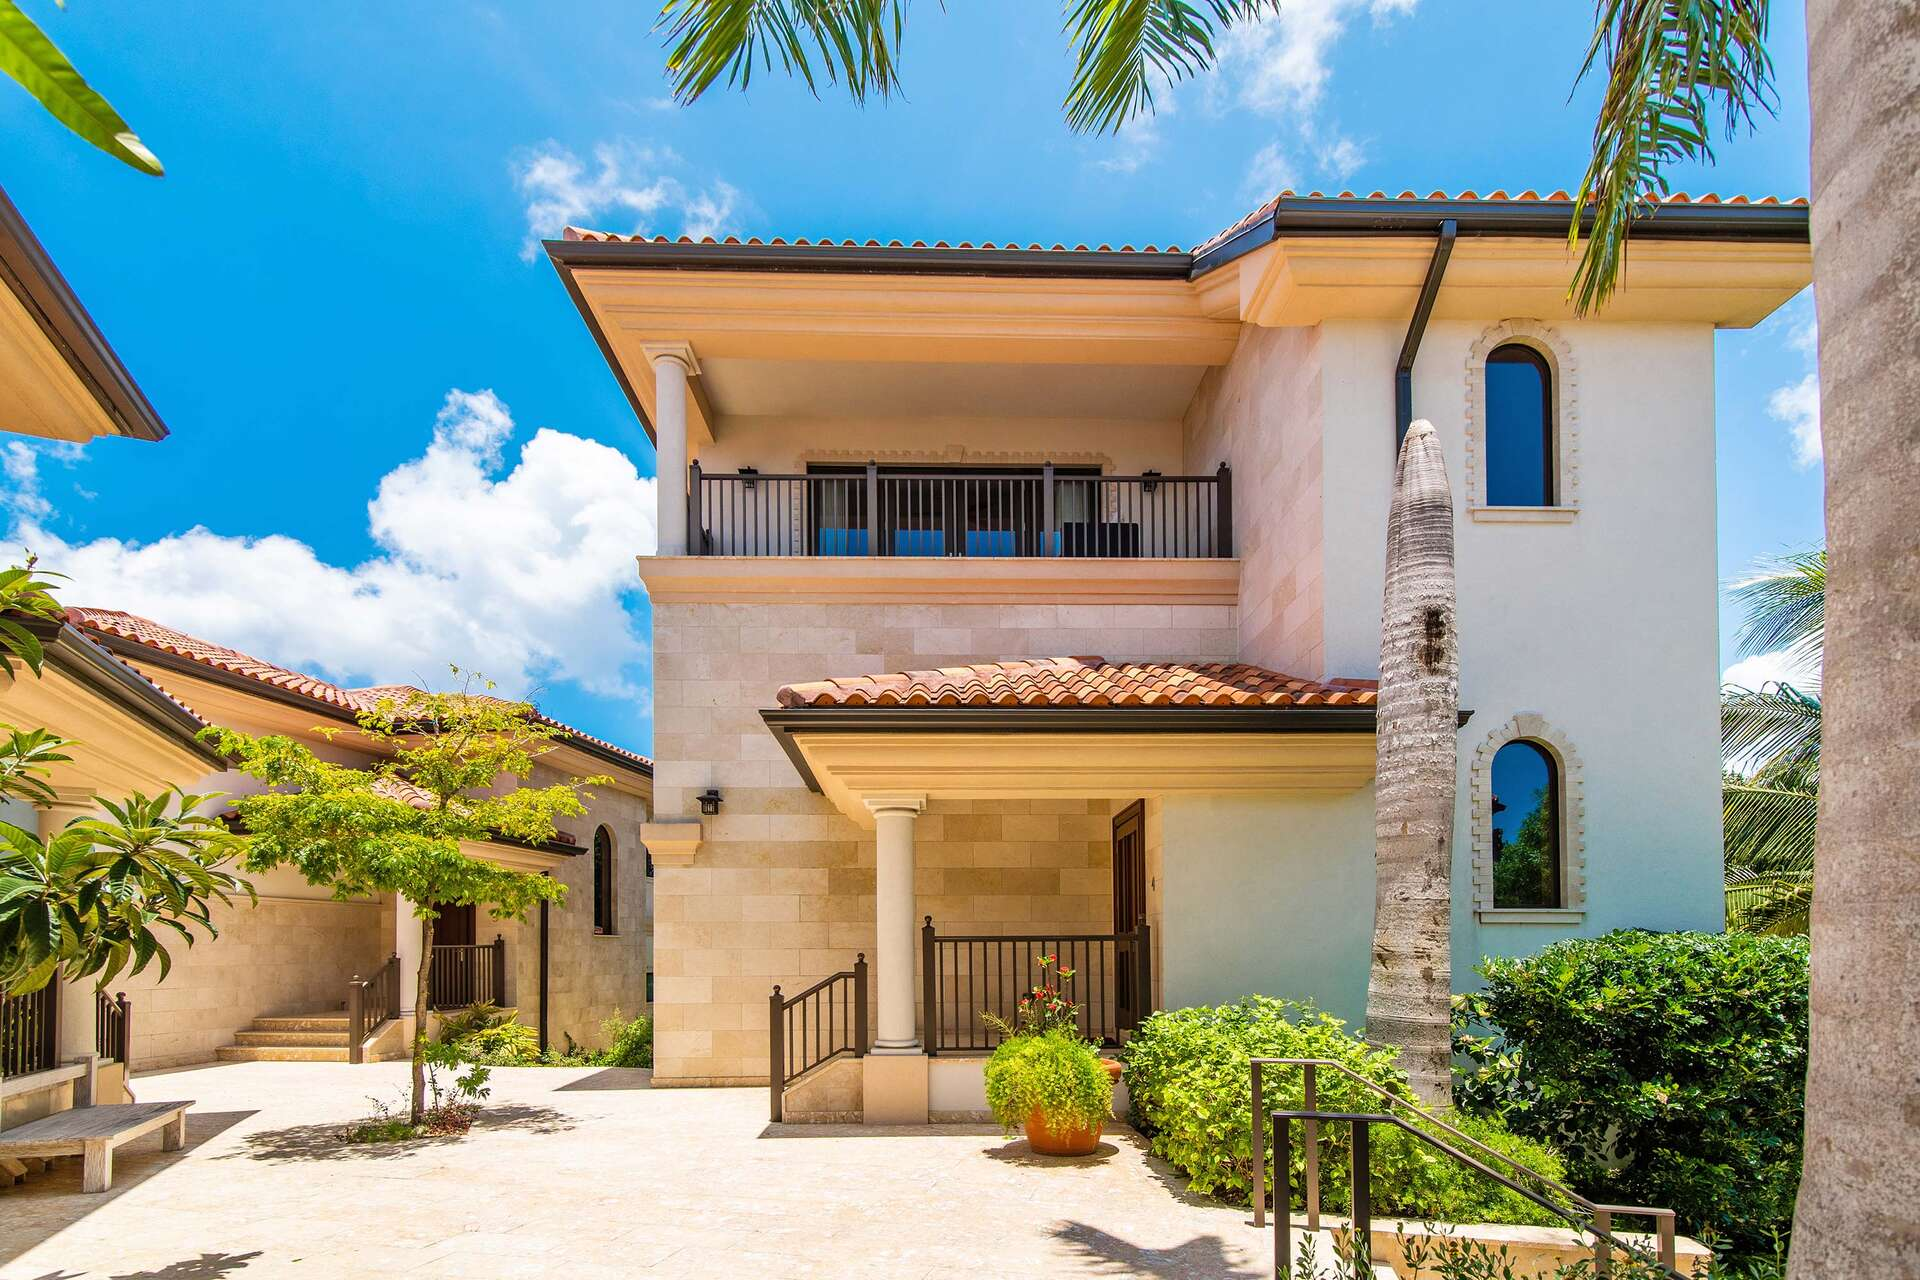 Luxury villa rentals caribbean - Cayman islands - Grand cayman - George town grand cayman - Casa Luna 4 - Image 1/23